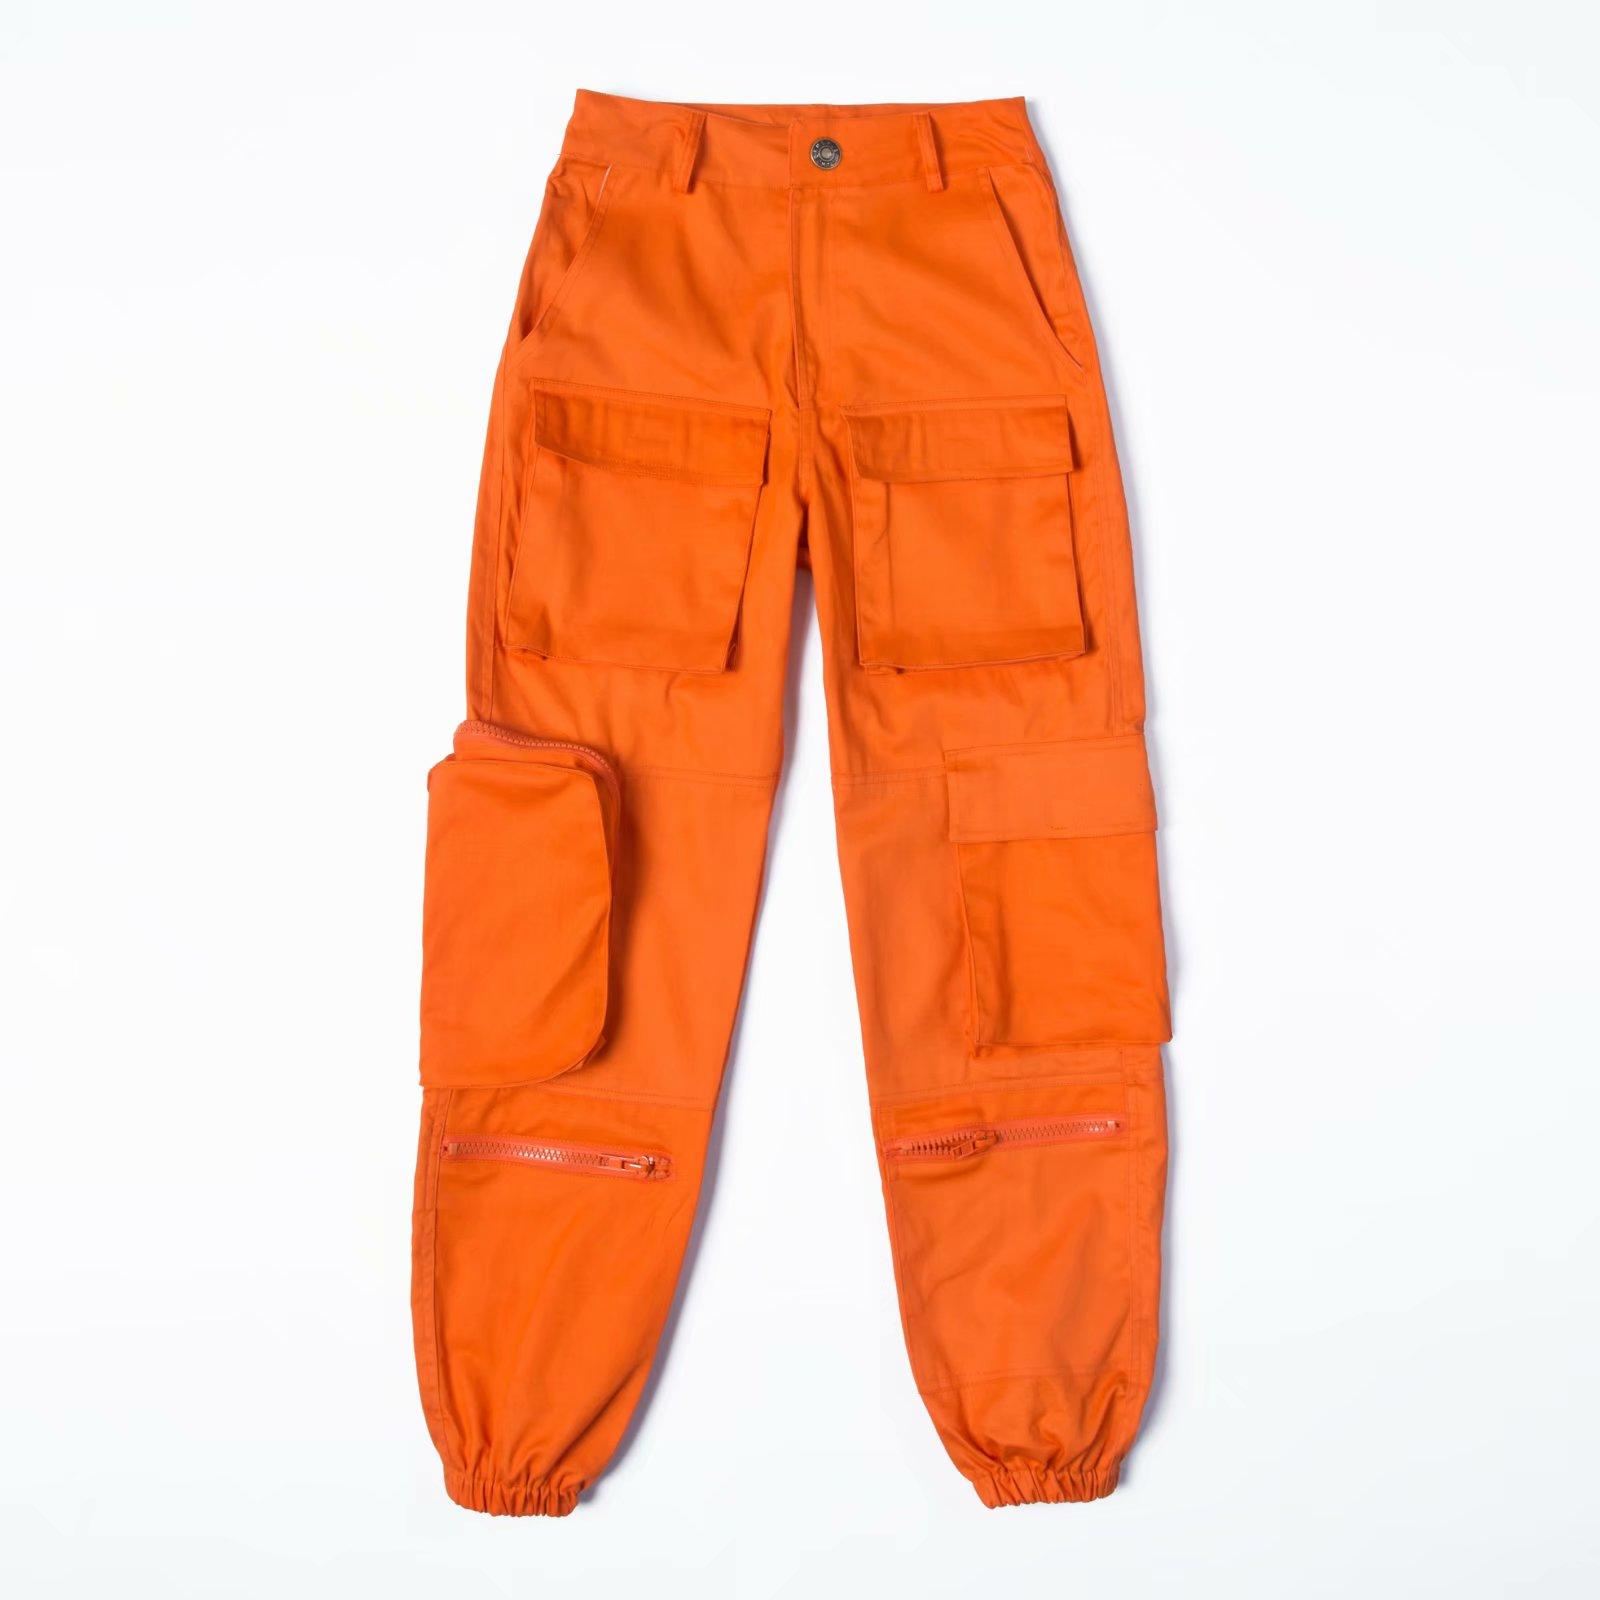 Fashion black high waist   pants   women cargo   pants   Streetwear loose joggers cotton   Capri   trousers female sweatpants 2019